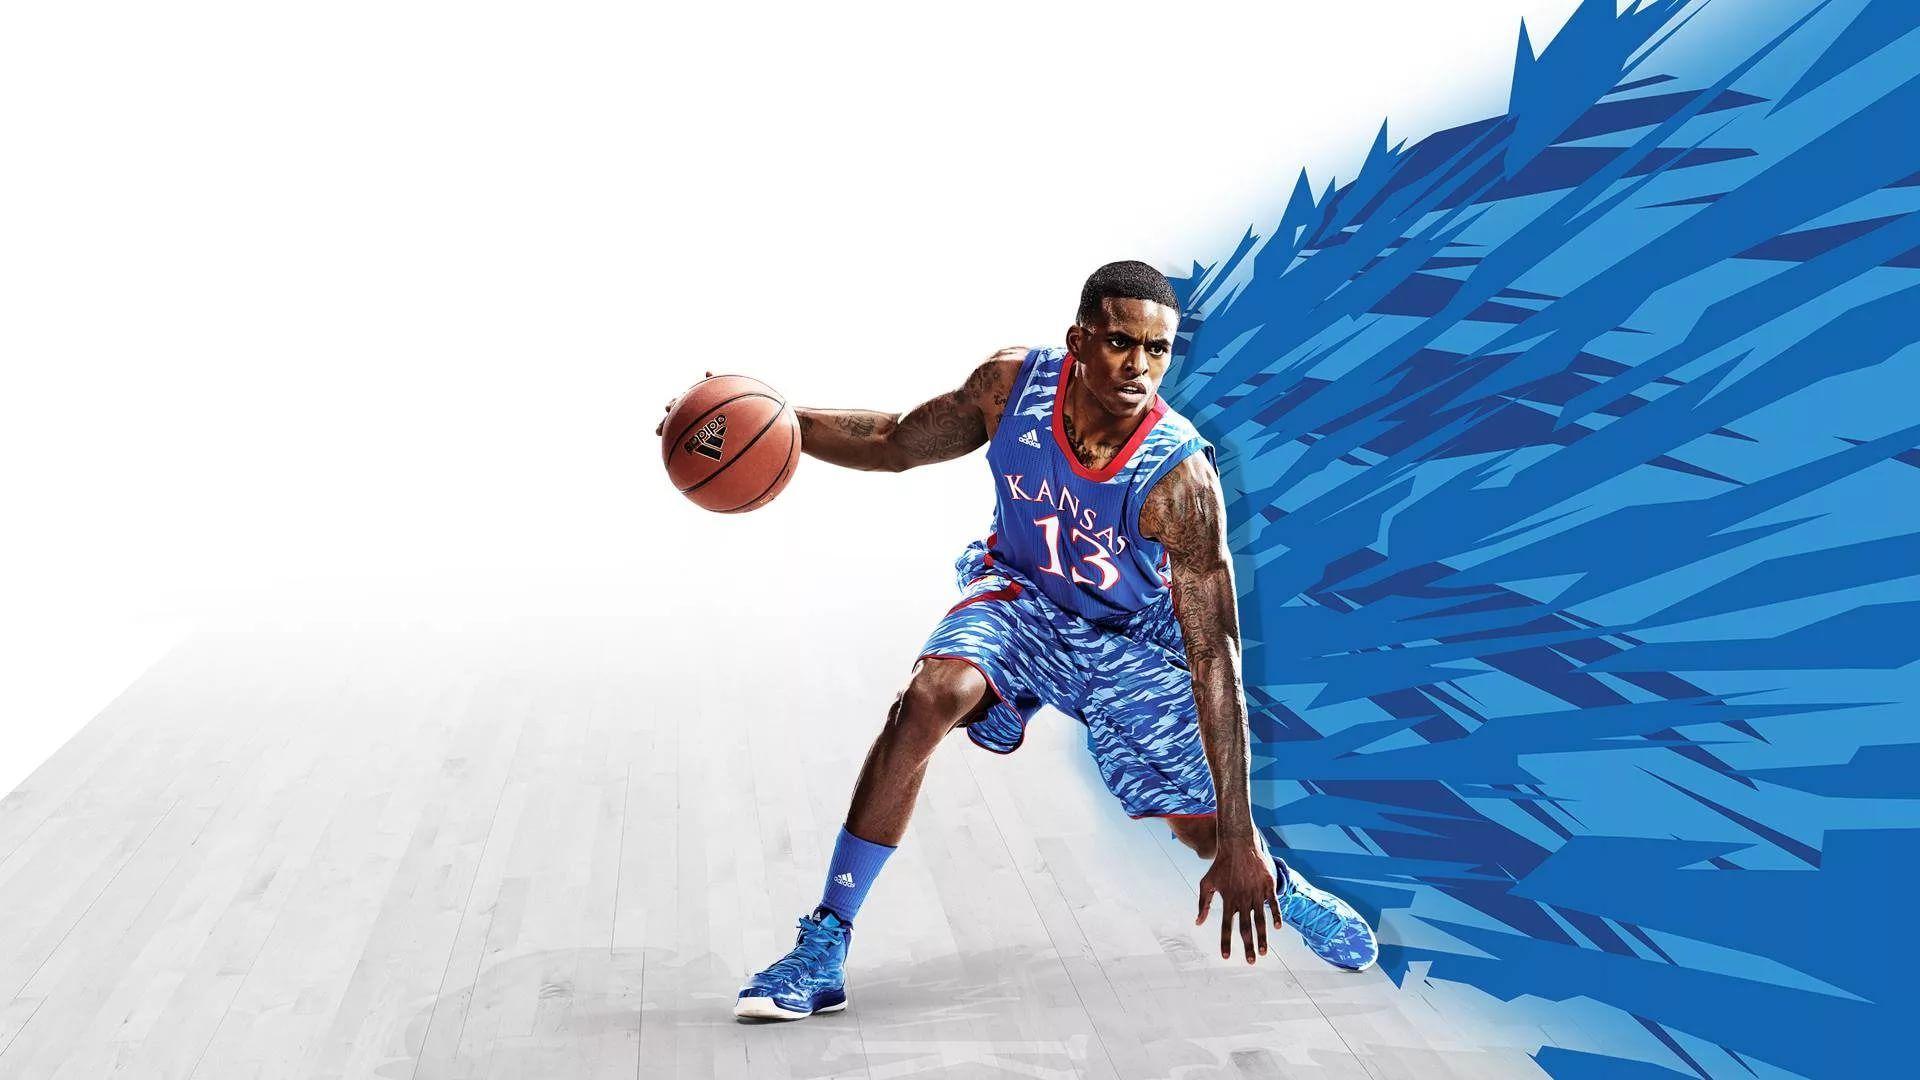 Nike Basketball Wallpapers 23 Images Wallpaperboat